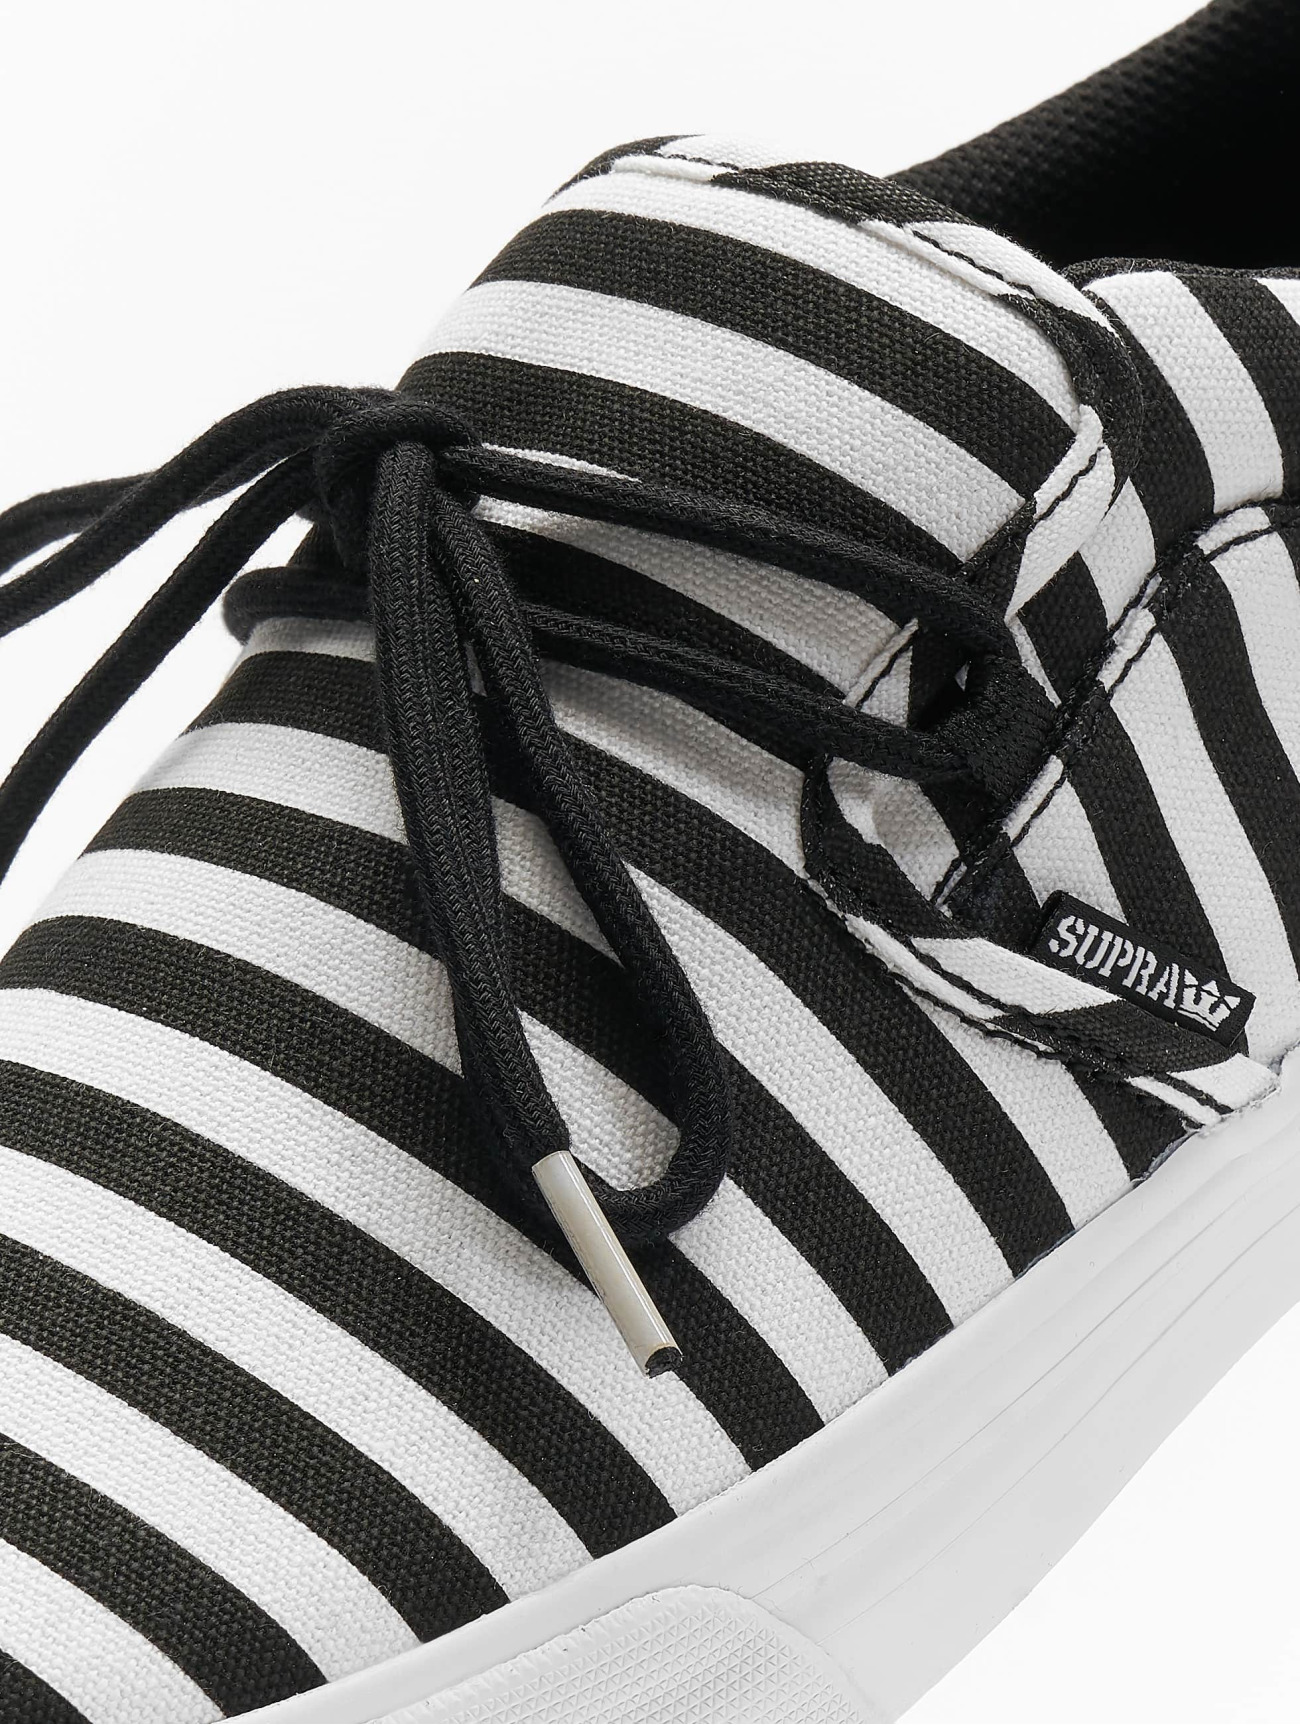 Supra Cuba noir Baskets 620457 Homme Chaussures